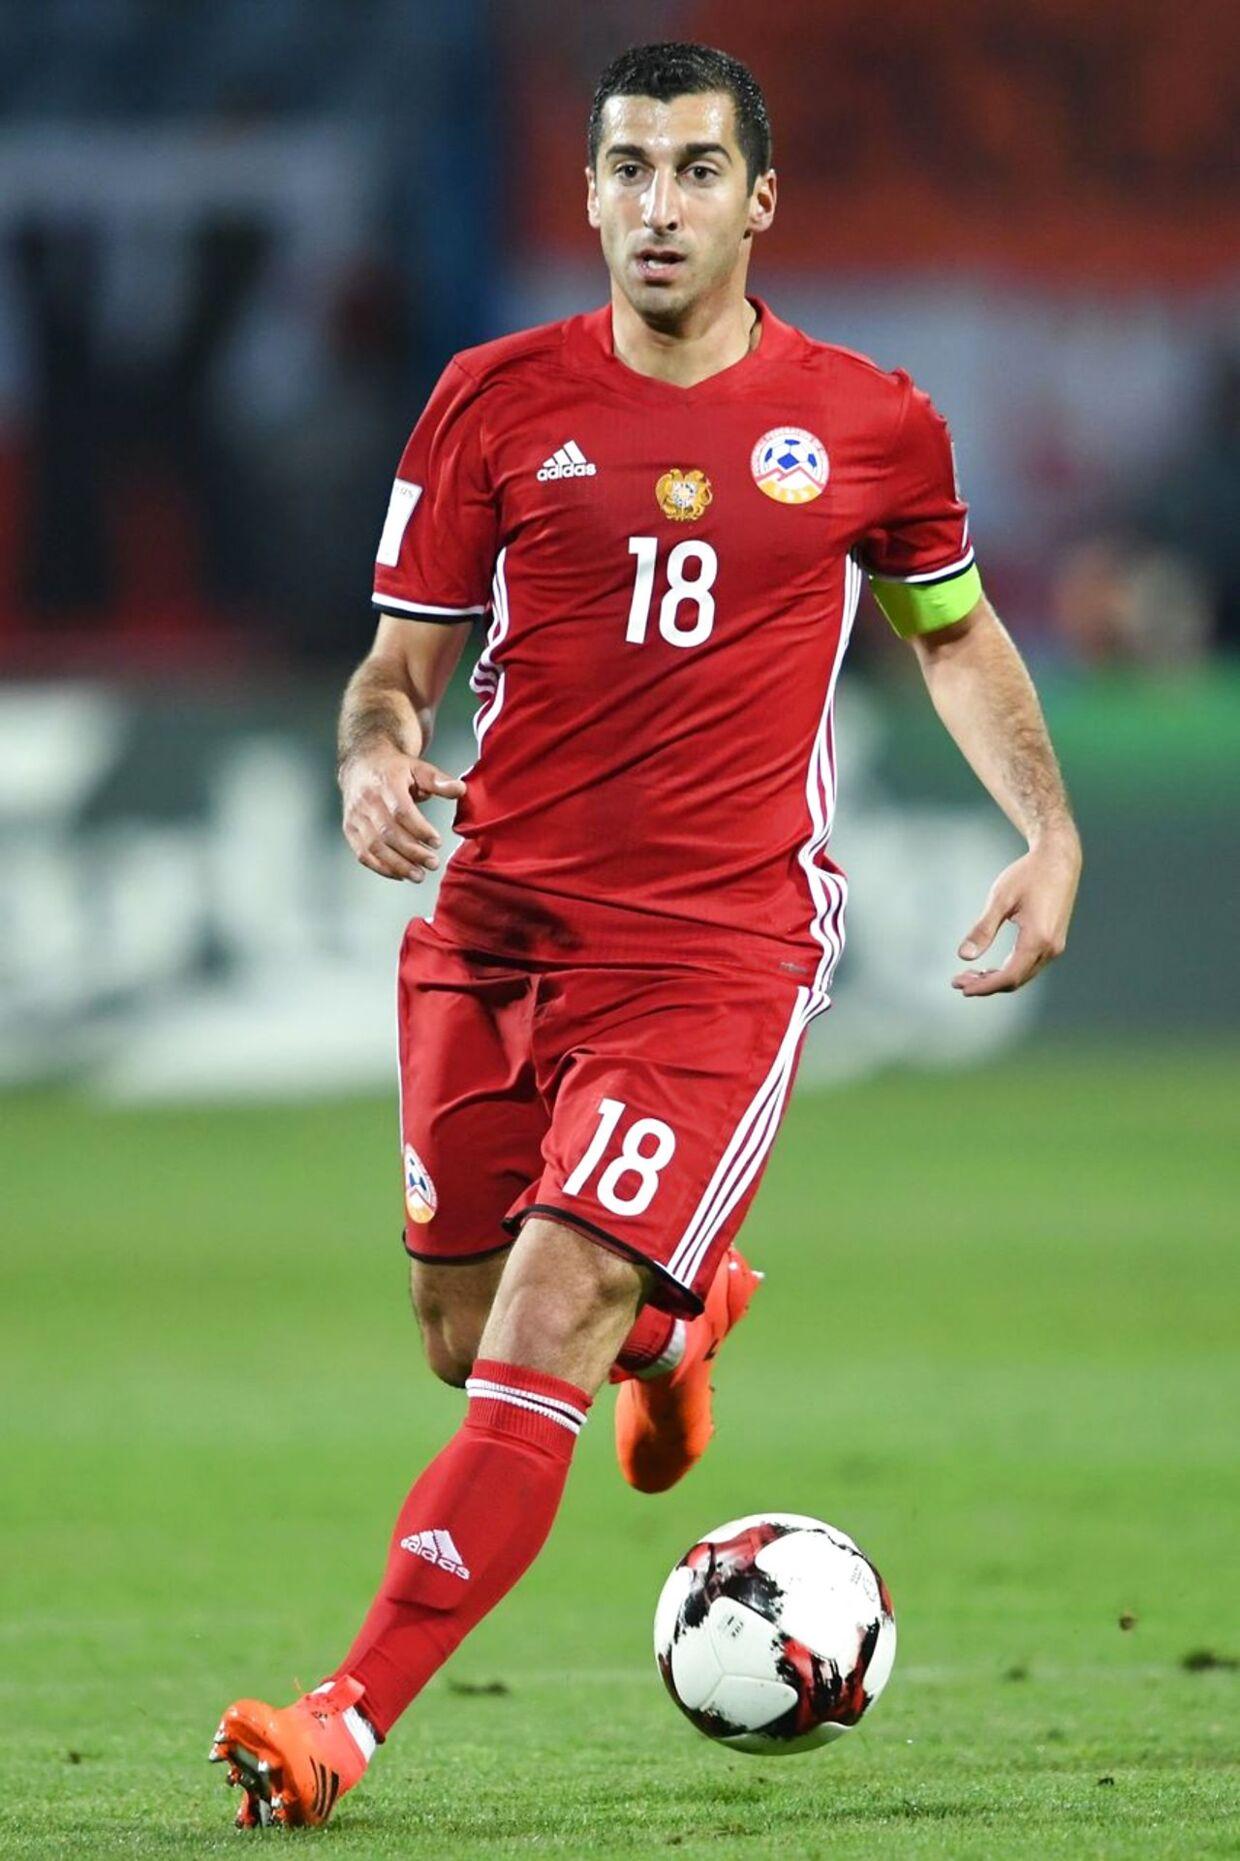 Henrikh Mkhitaryan